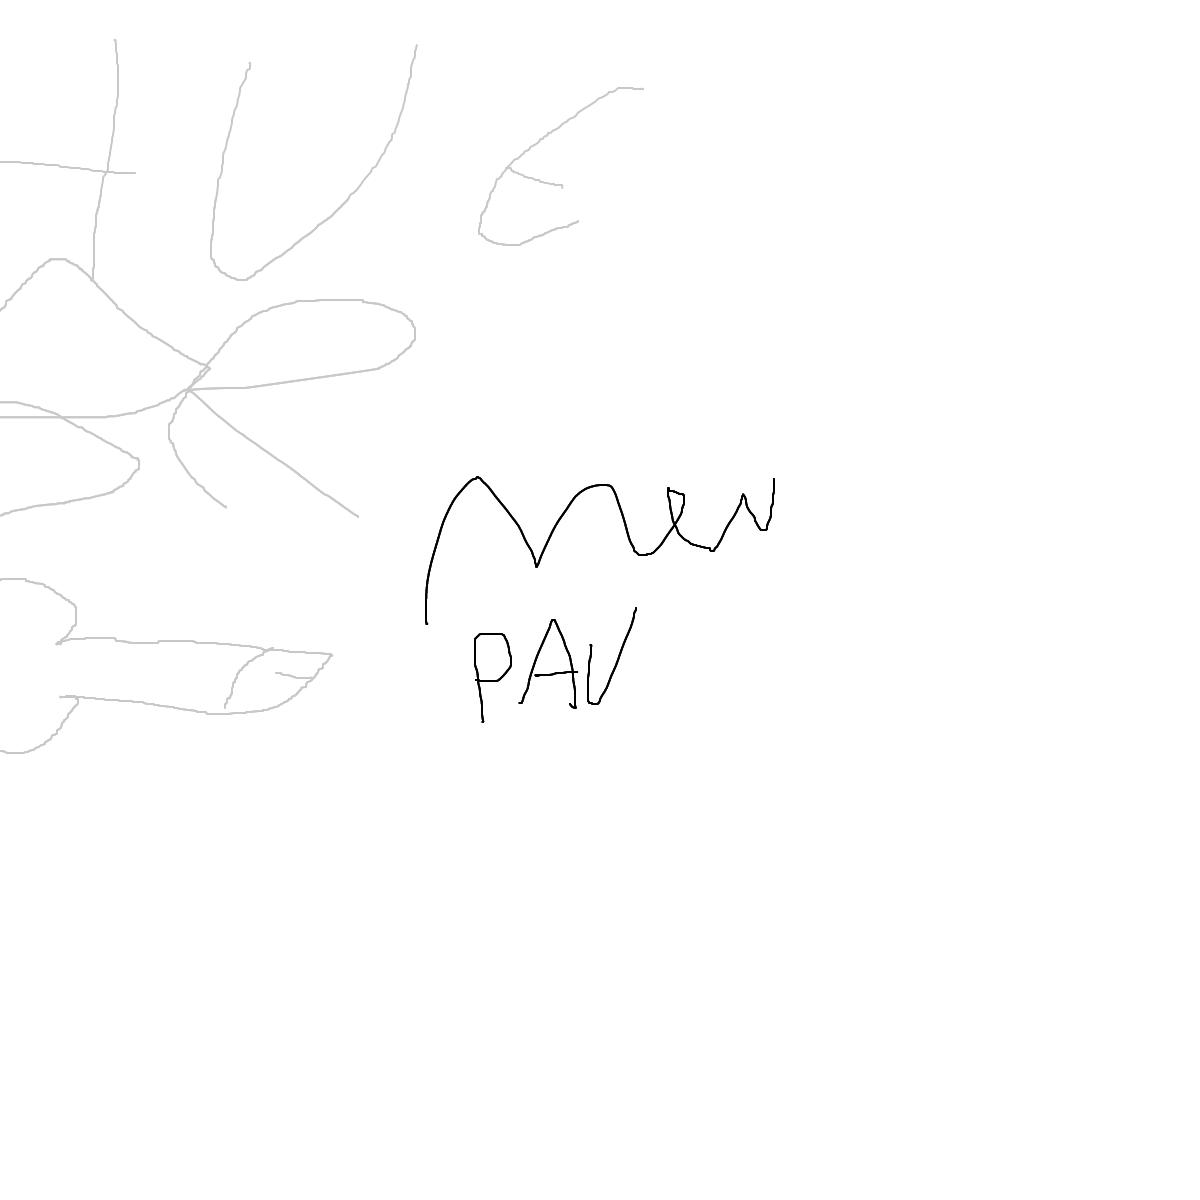 BAAAM drawing#17094 lat:-23.5576305389404300lng: -46.6347732543945300